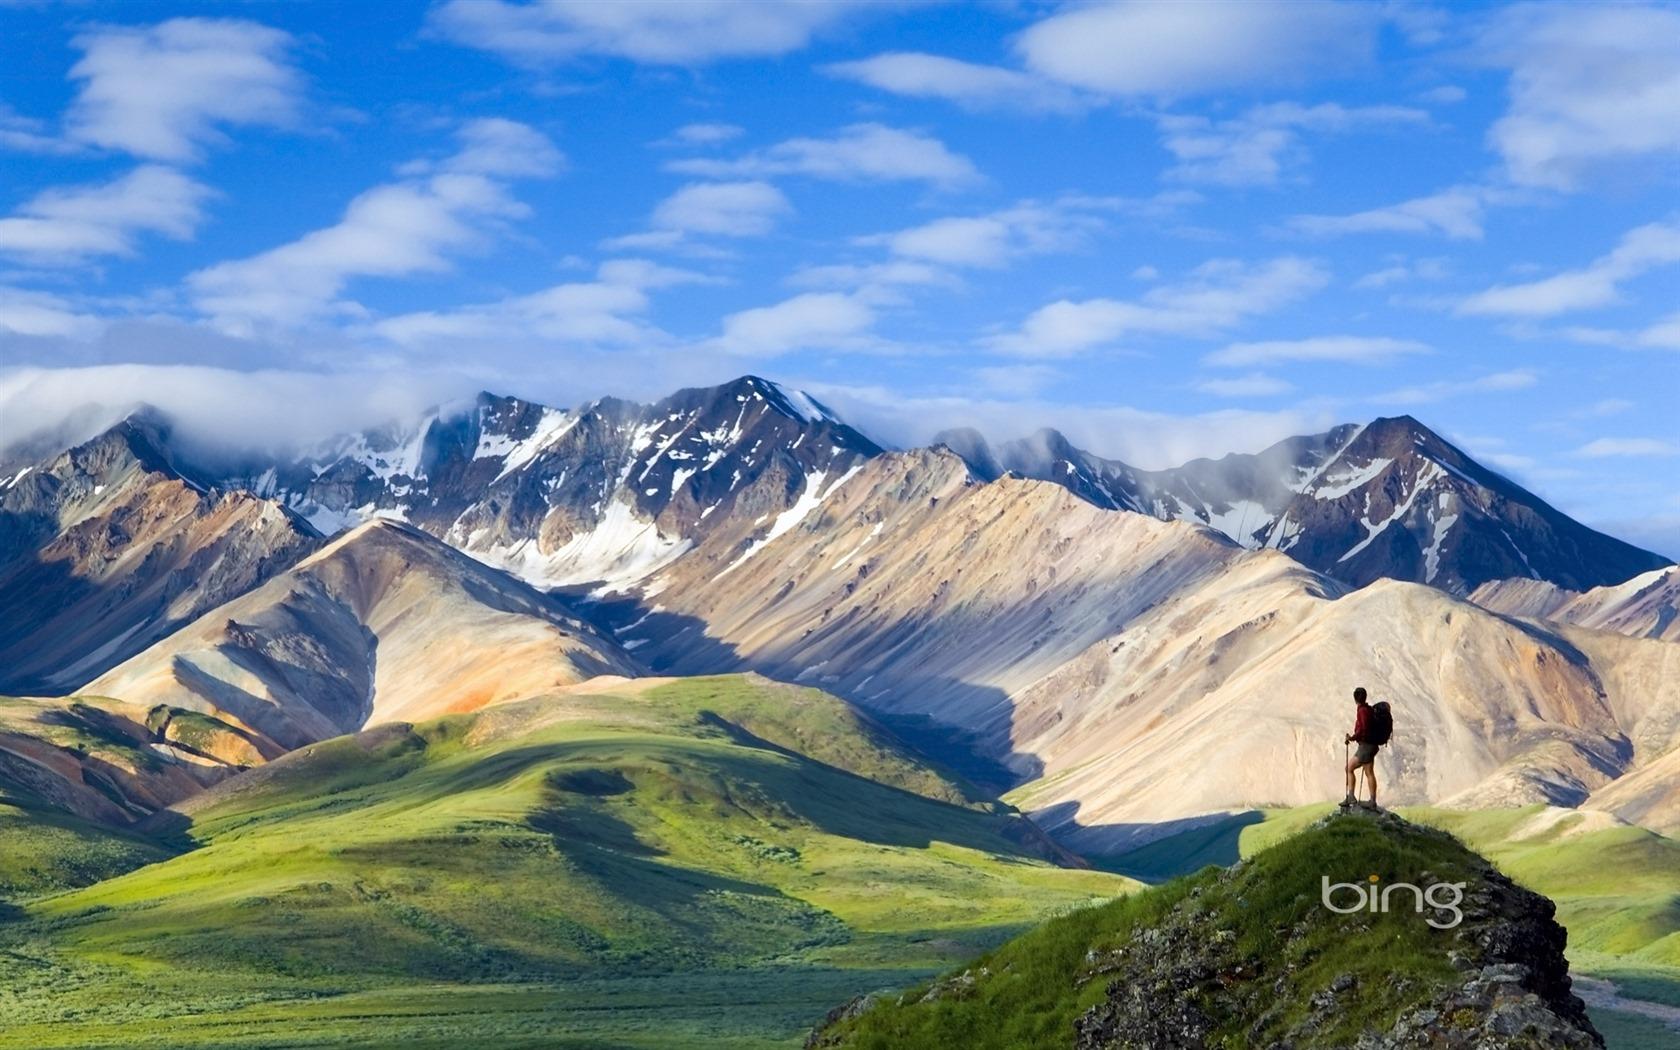 Bing Themes mountains climbers widescreen HD wallpaper   1680x1050 1680x1050